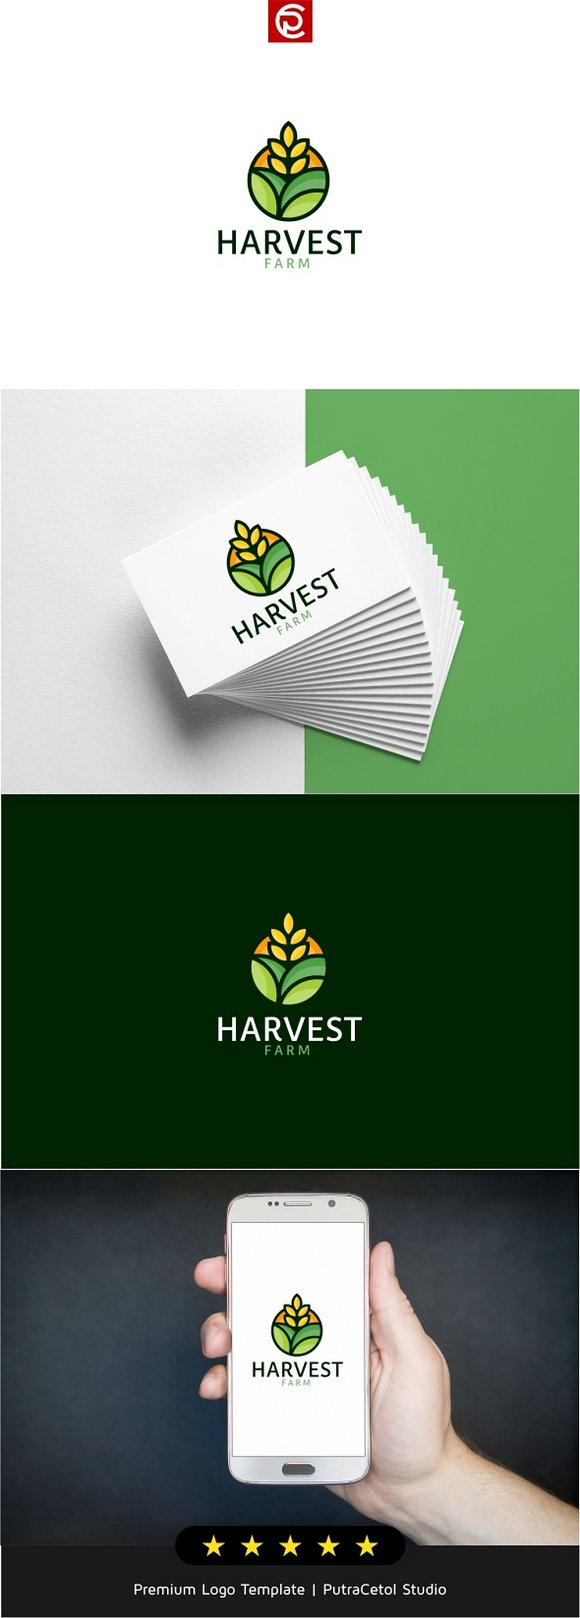 Harvest Farm Logo